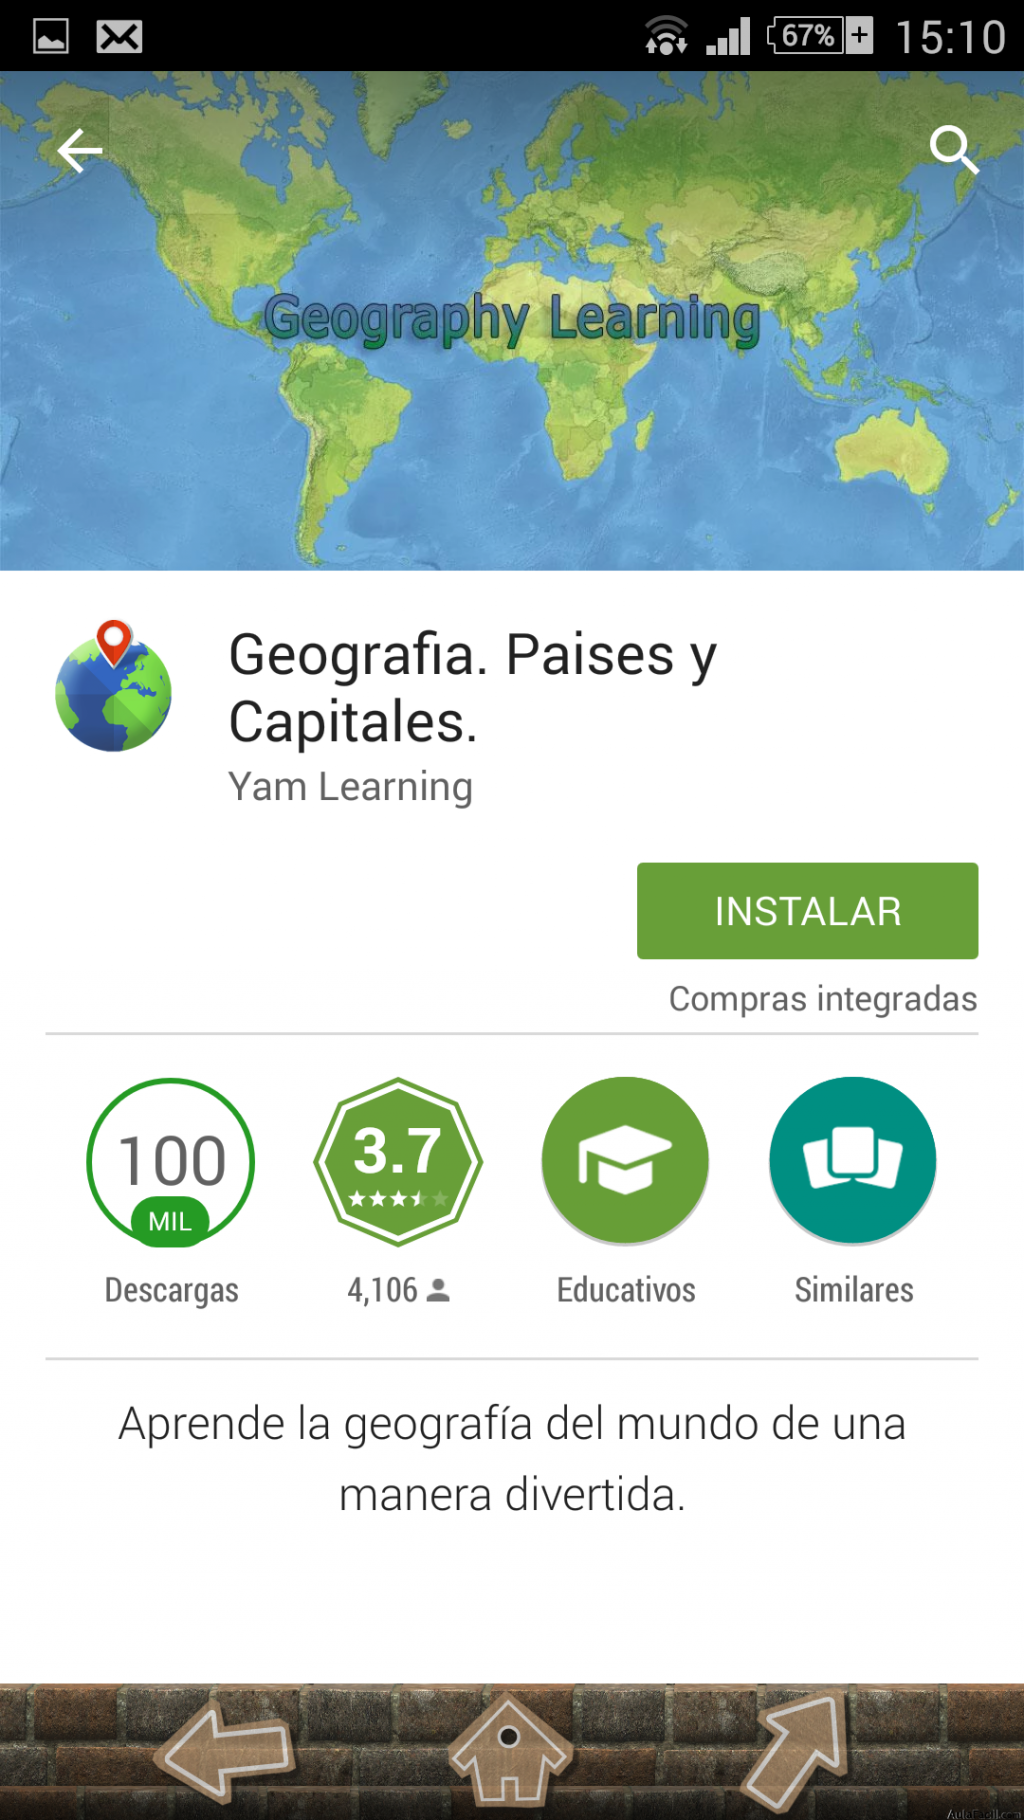 Juegos Educativos Gratis Te gustara aprender geografa jugando